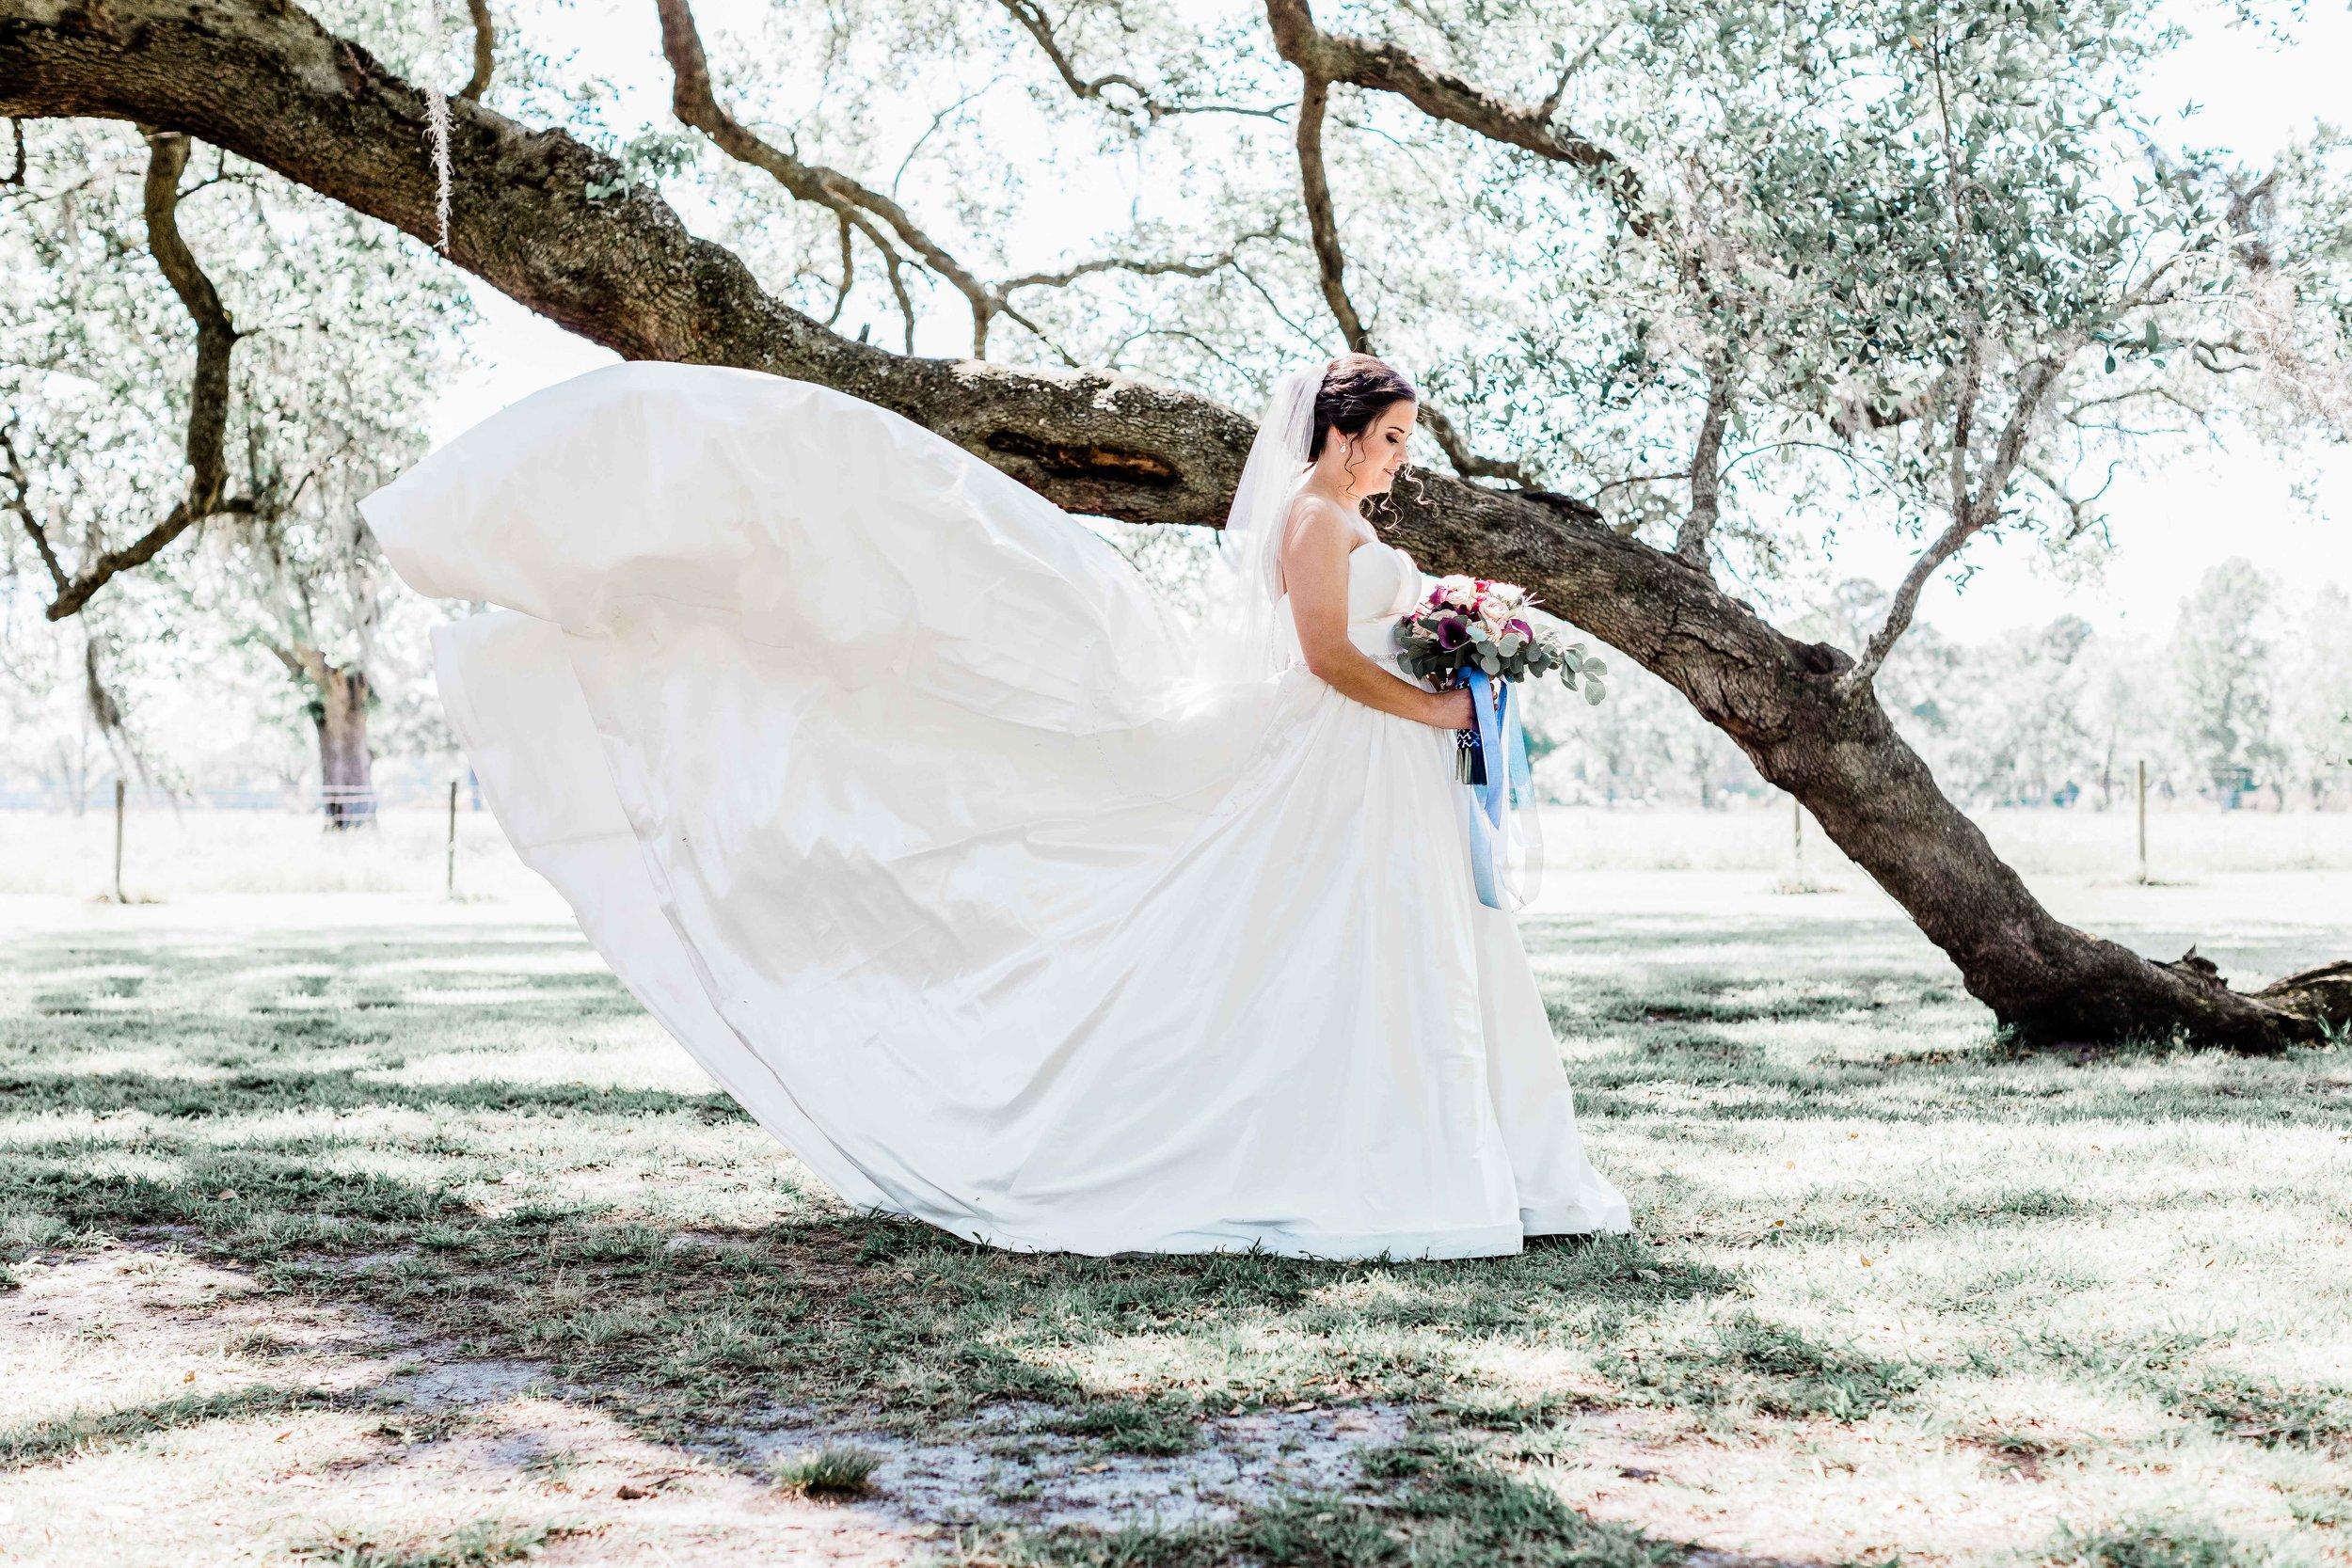 20190427-Southern Lens Photography- Savannah Wedding Photographer-Screven and Caroline-201956.jpg